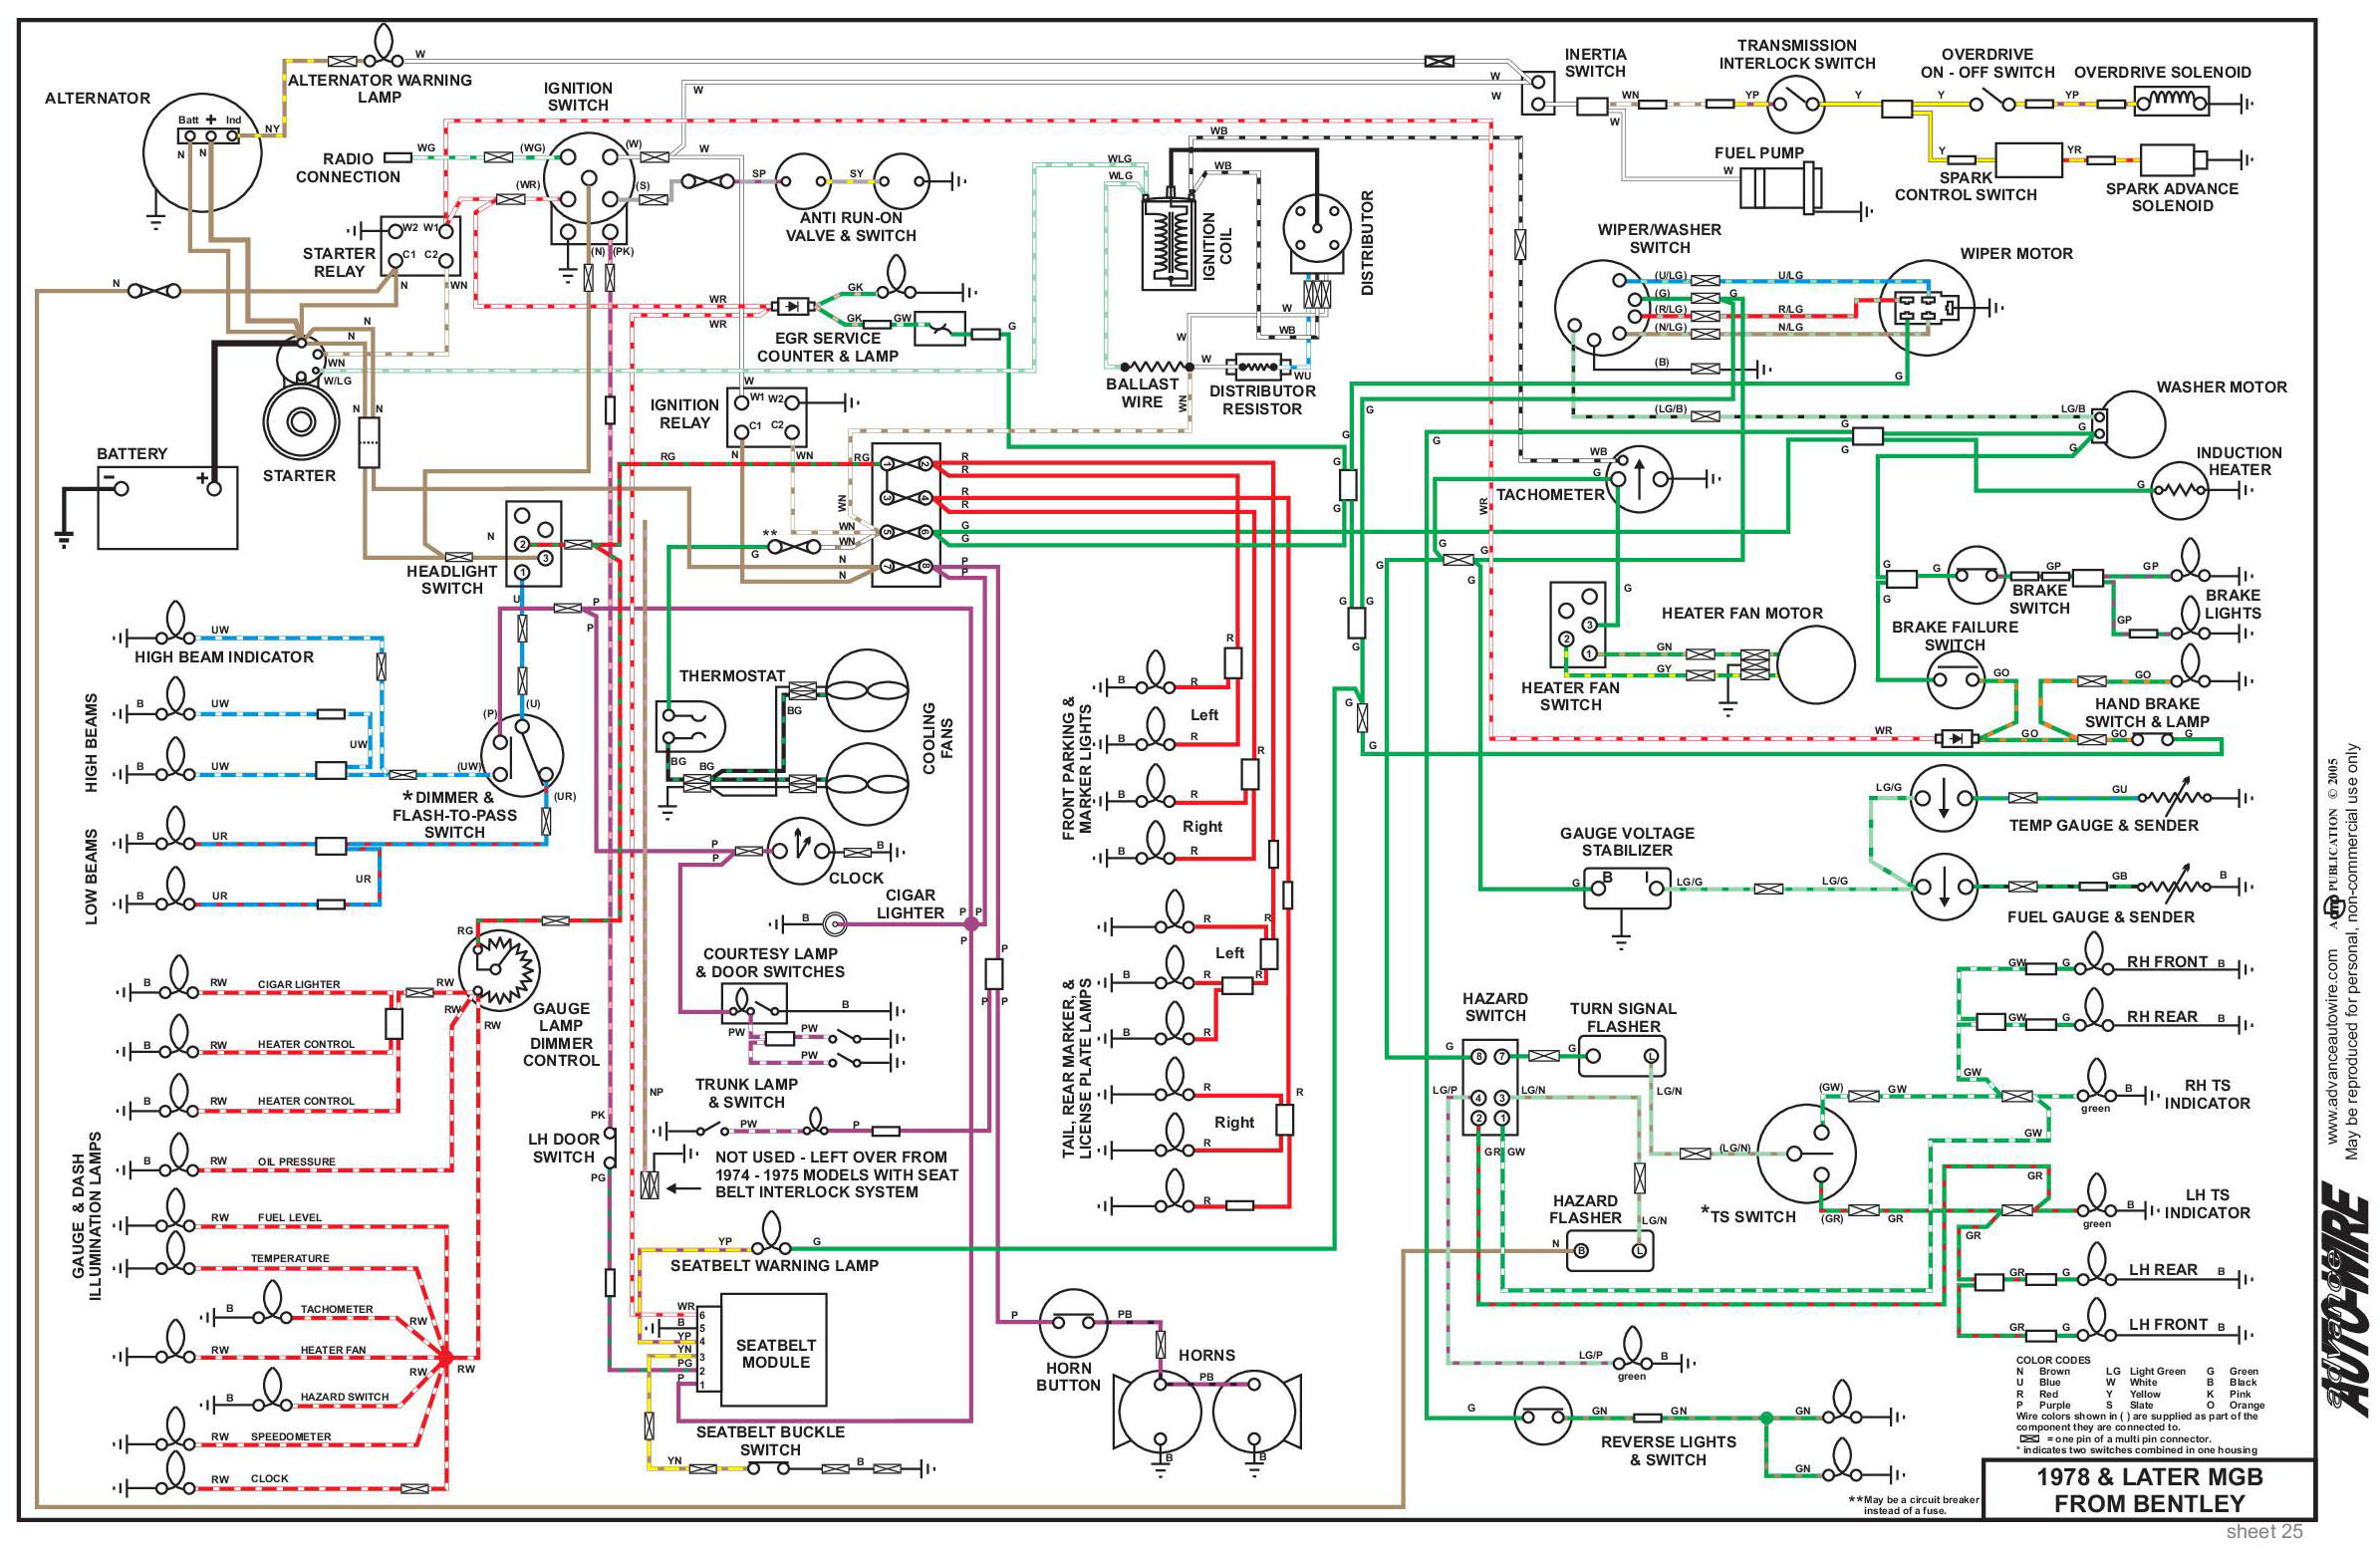 Mgb Wiring Diagram - Wiring Diagrams Thumbs - Mgb Wiring Diagram